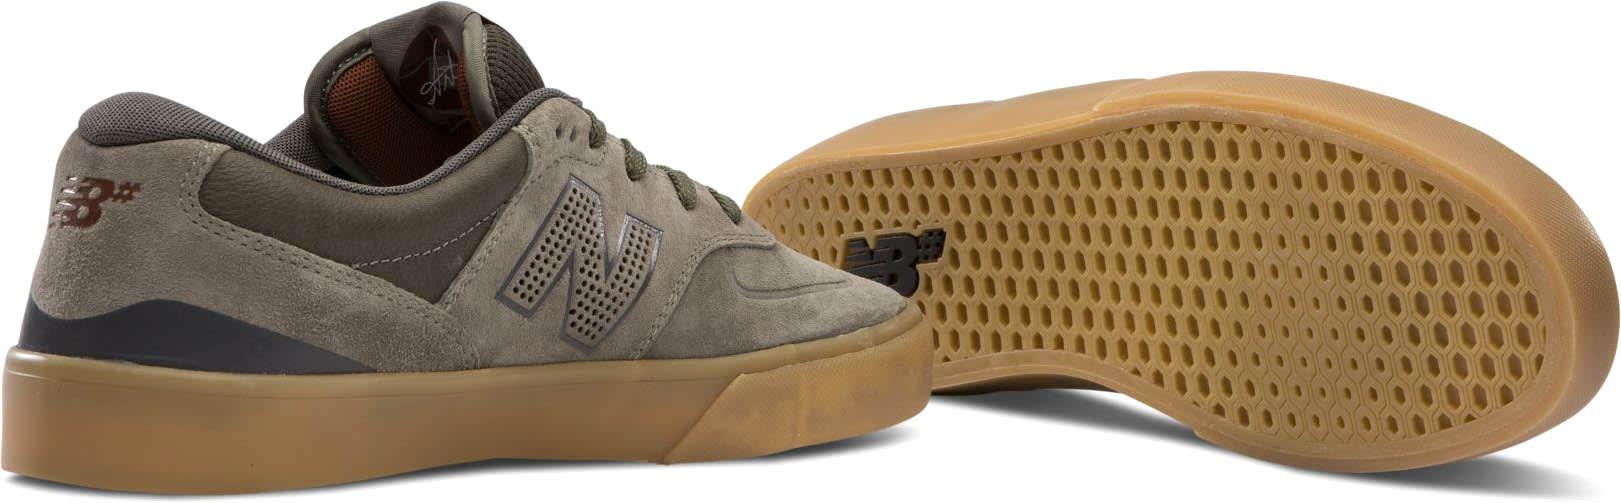 a01b91d18741c New Balance Numeric Arto 358 Skate Shoes - thumbnail 3